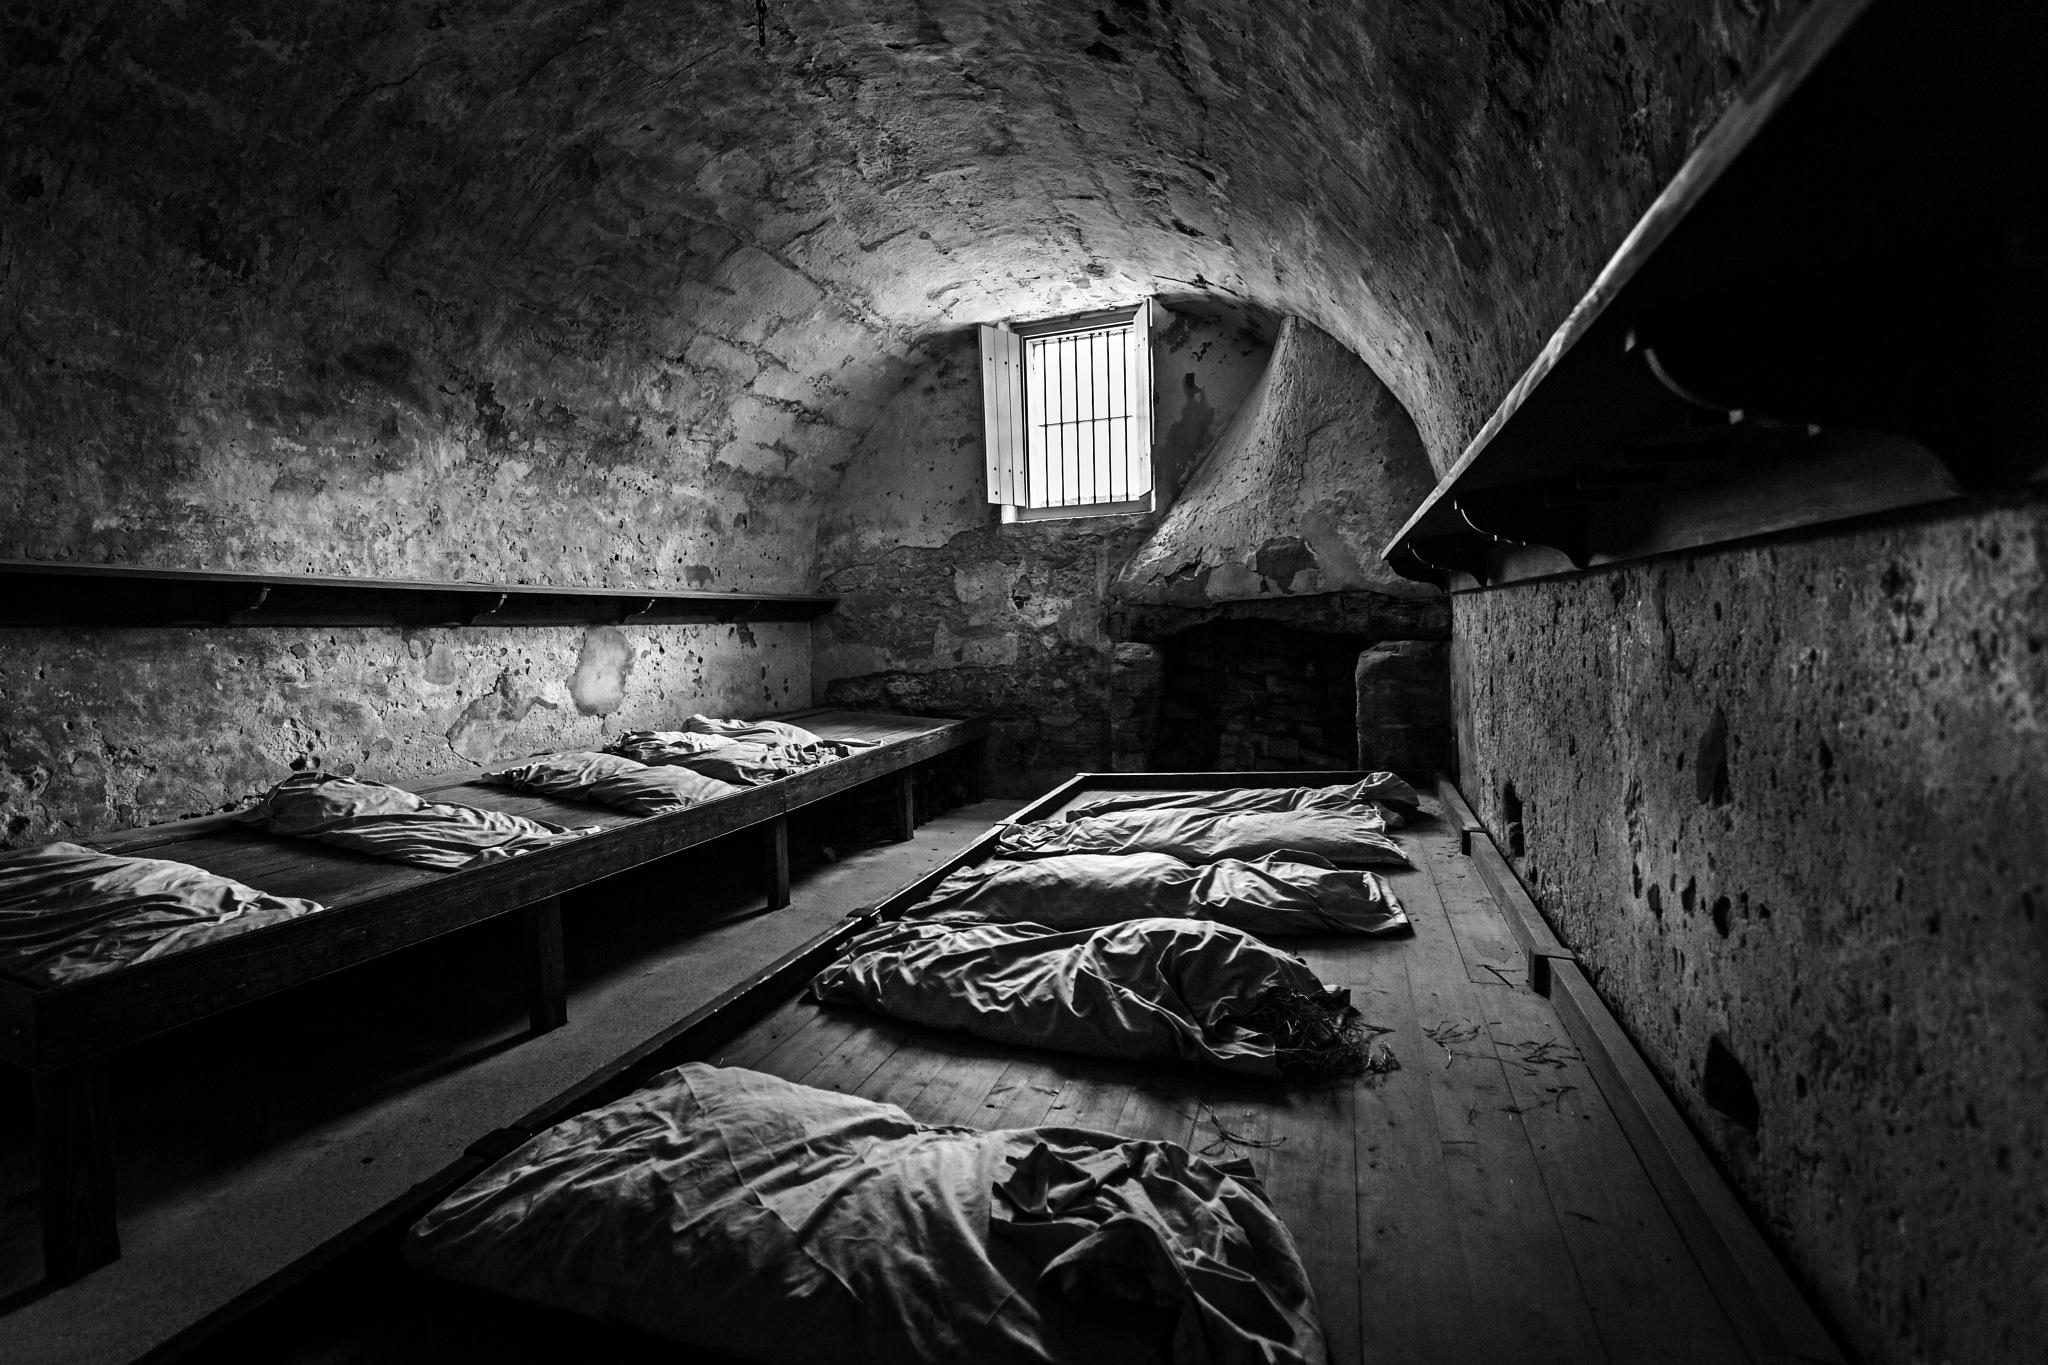 Sleeping quarters by Bryan L. Williams